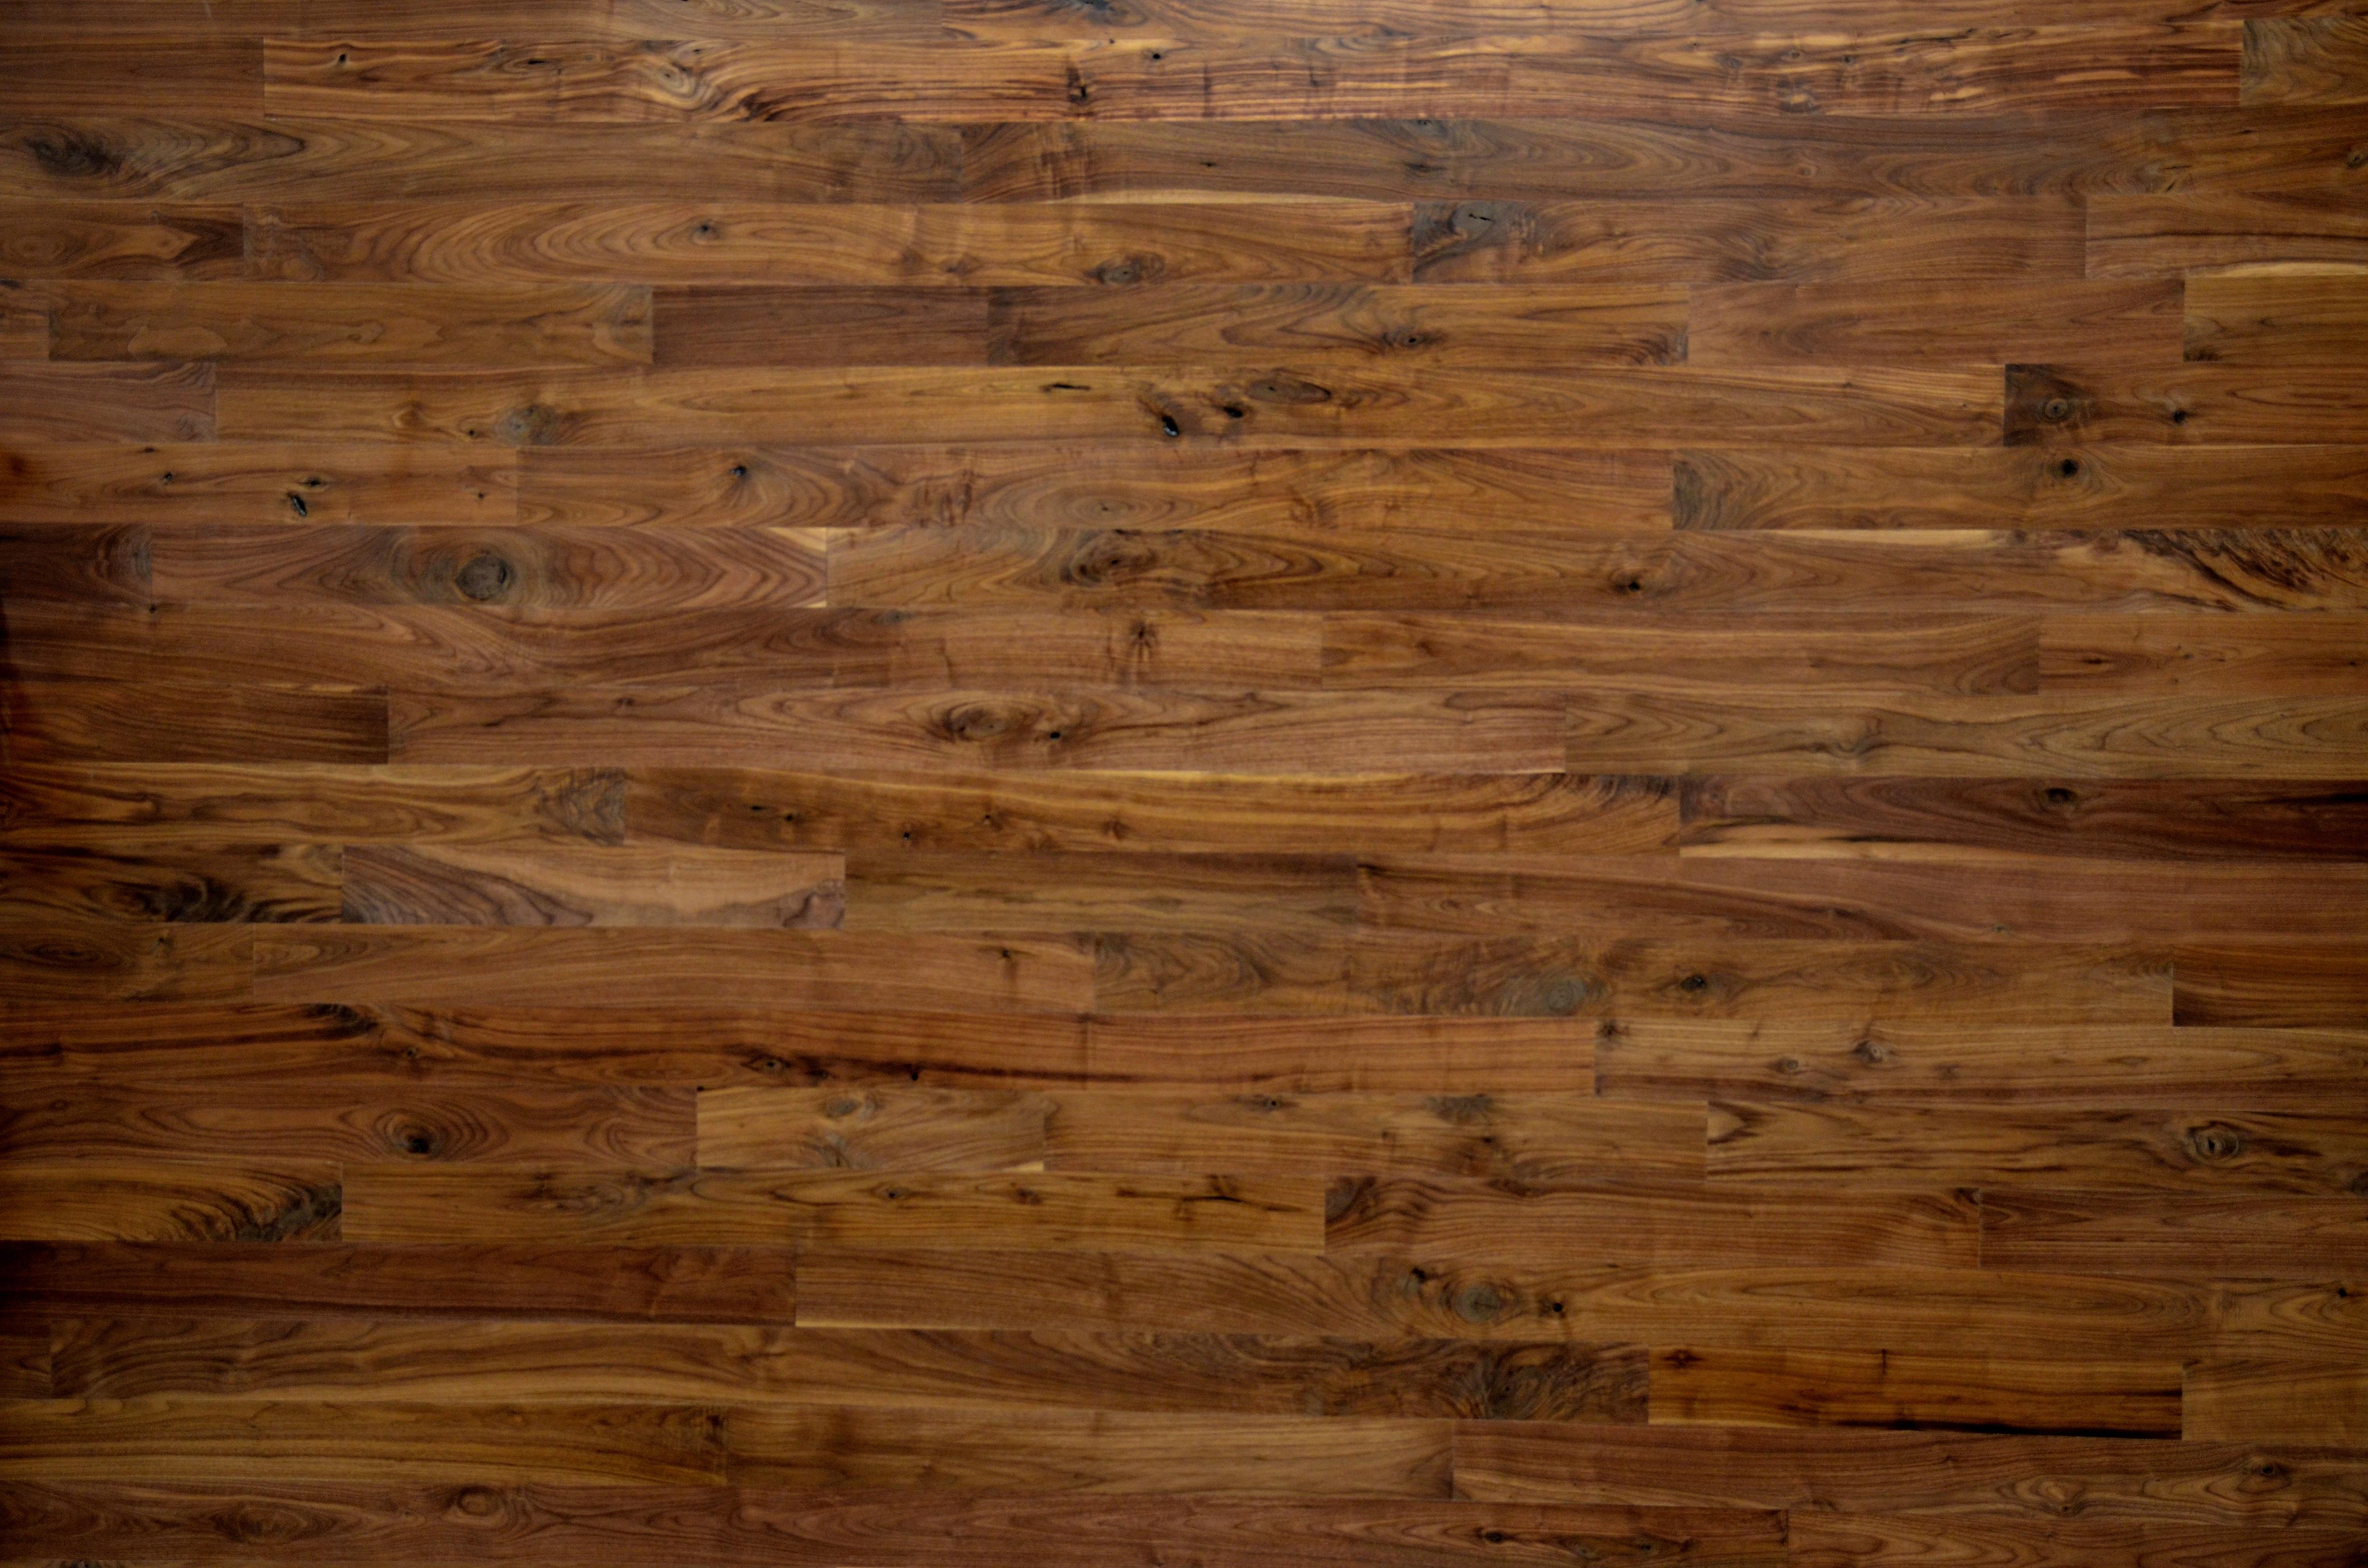 red oak hardwood flooring unfinished of lacrosse hardwood flooring walnut white oak red oak hickory in natual walnut